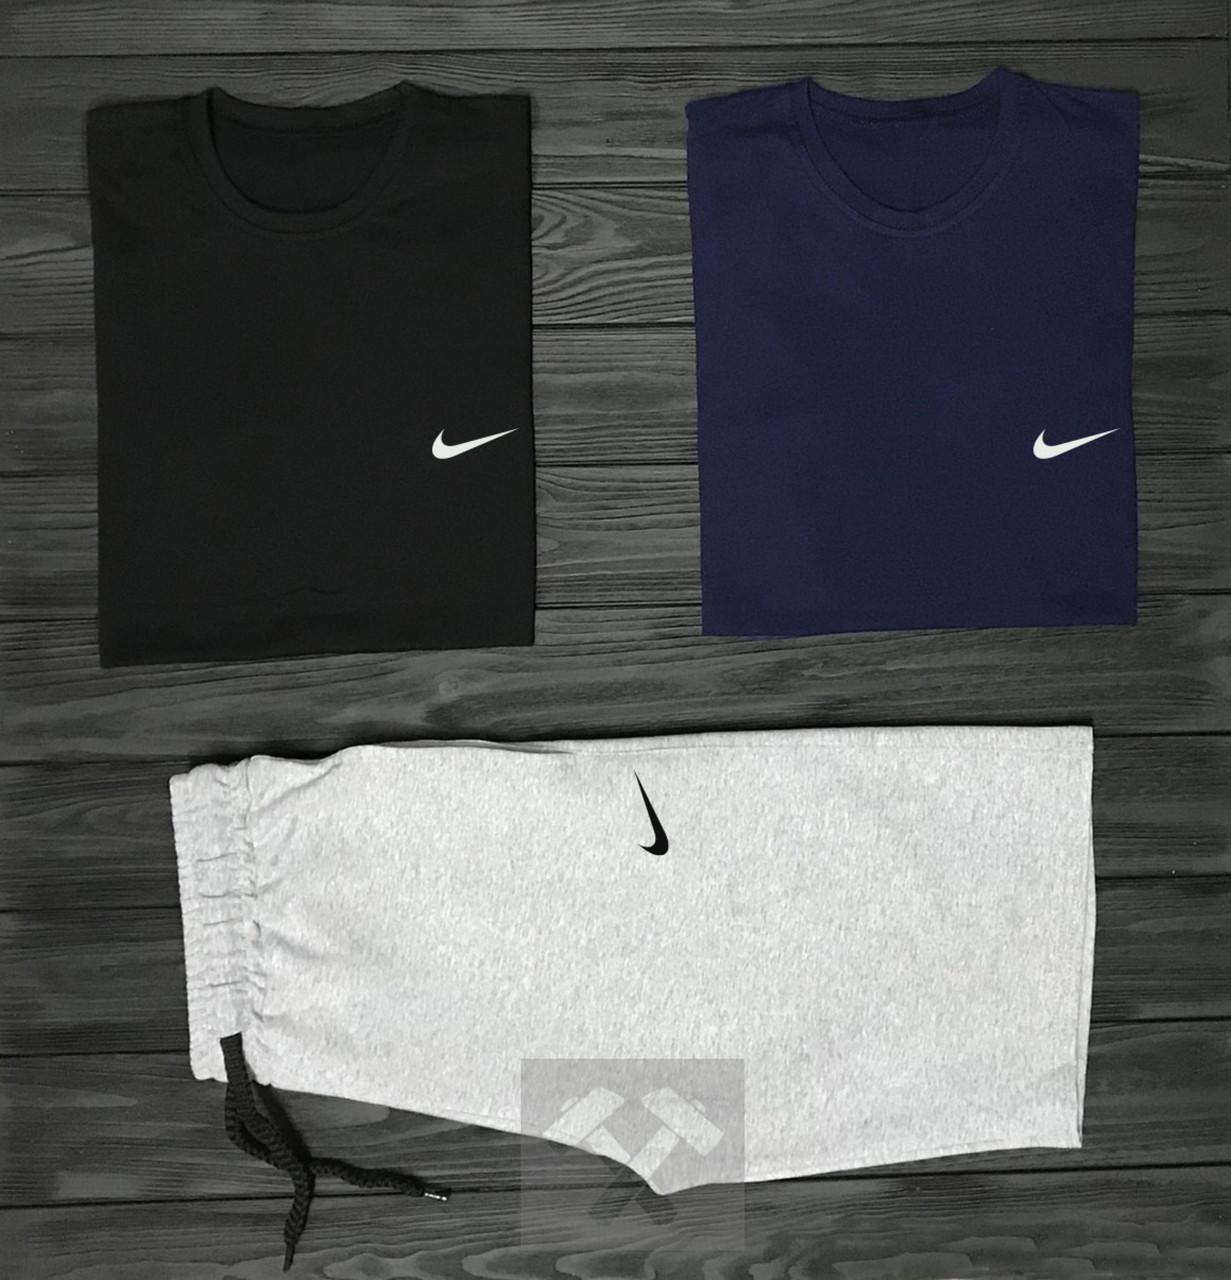 Мужской костюм тройка 2 футболки и шорты Найк (Nike), Турецкий трикотаж, копия